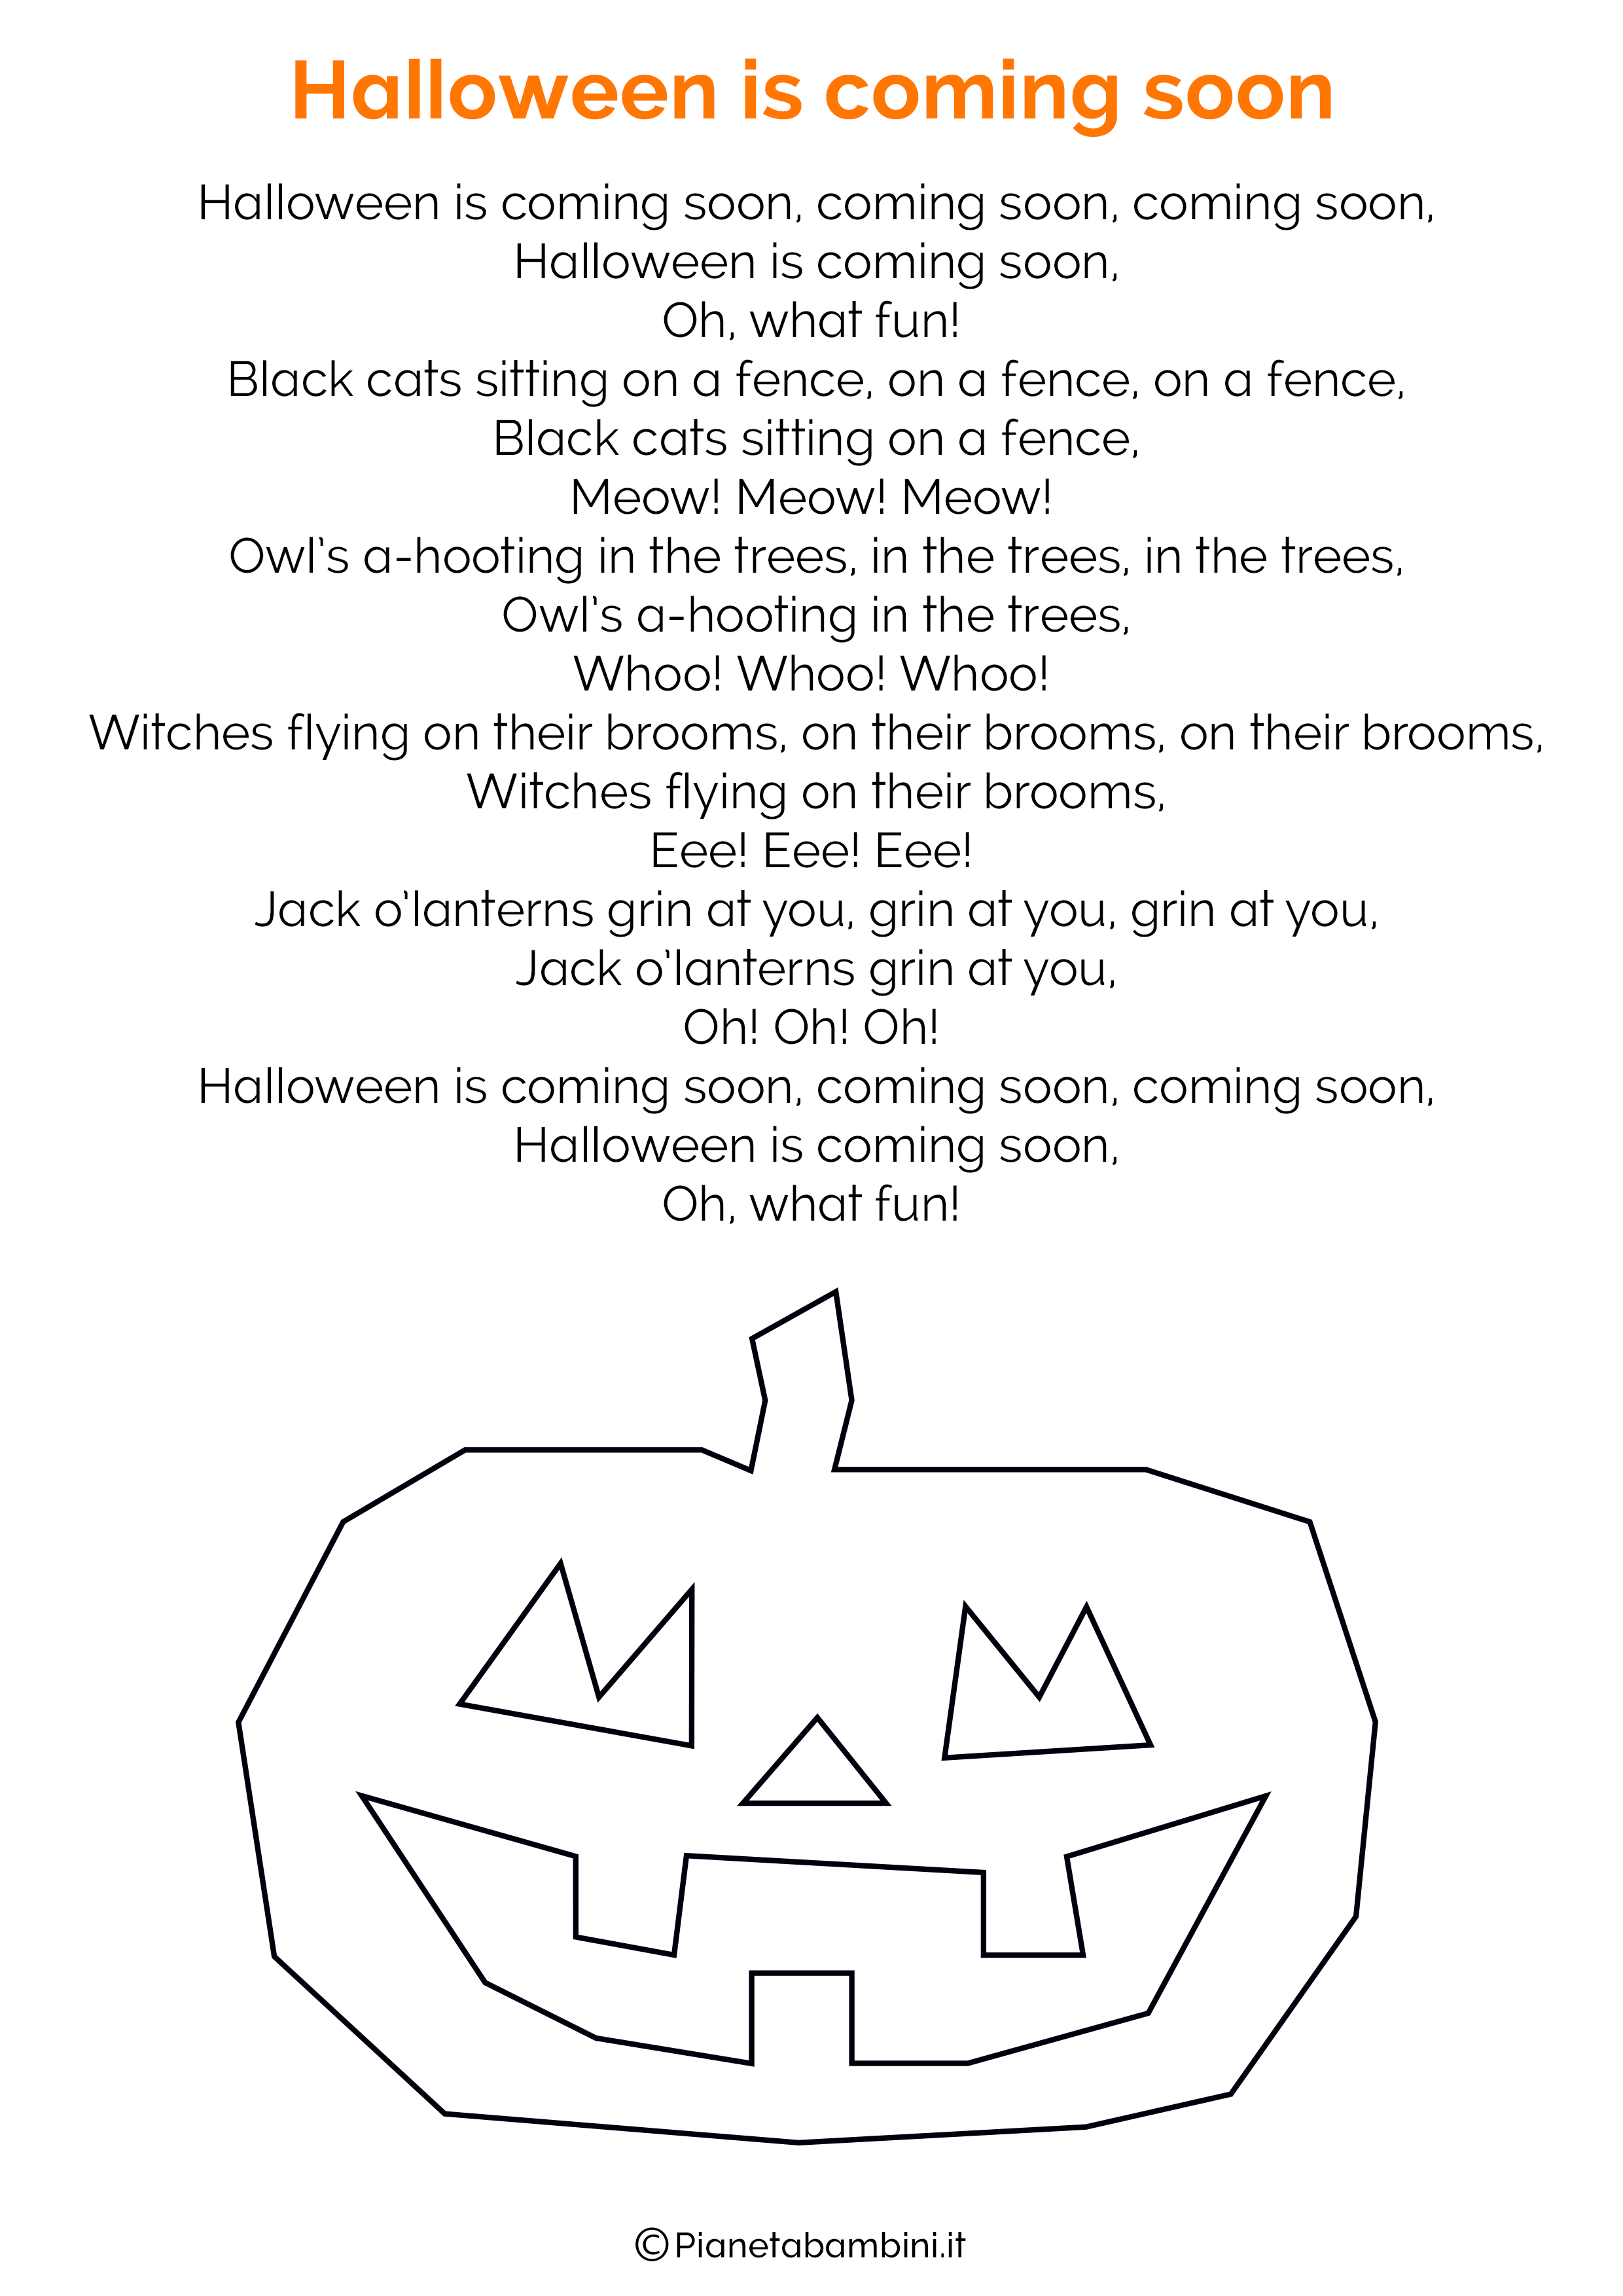 Filastrocca di Halloween in Inglese per bambini 03